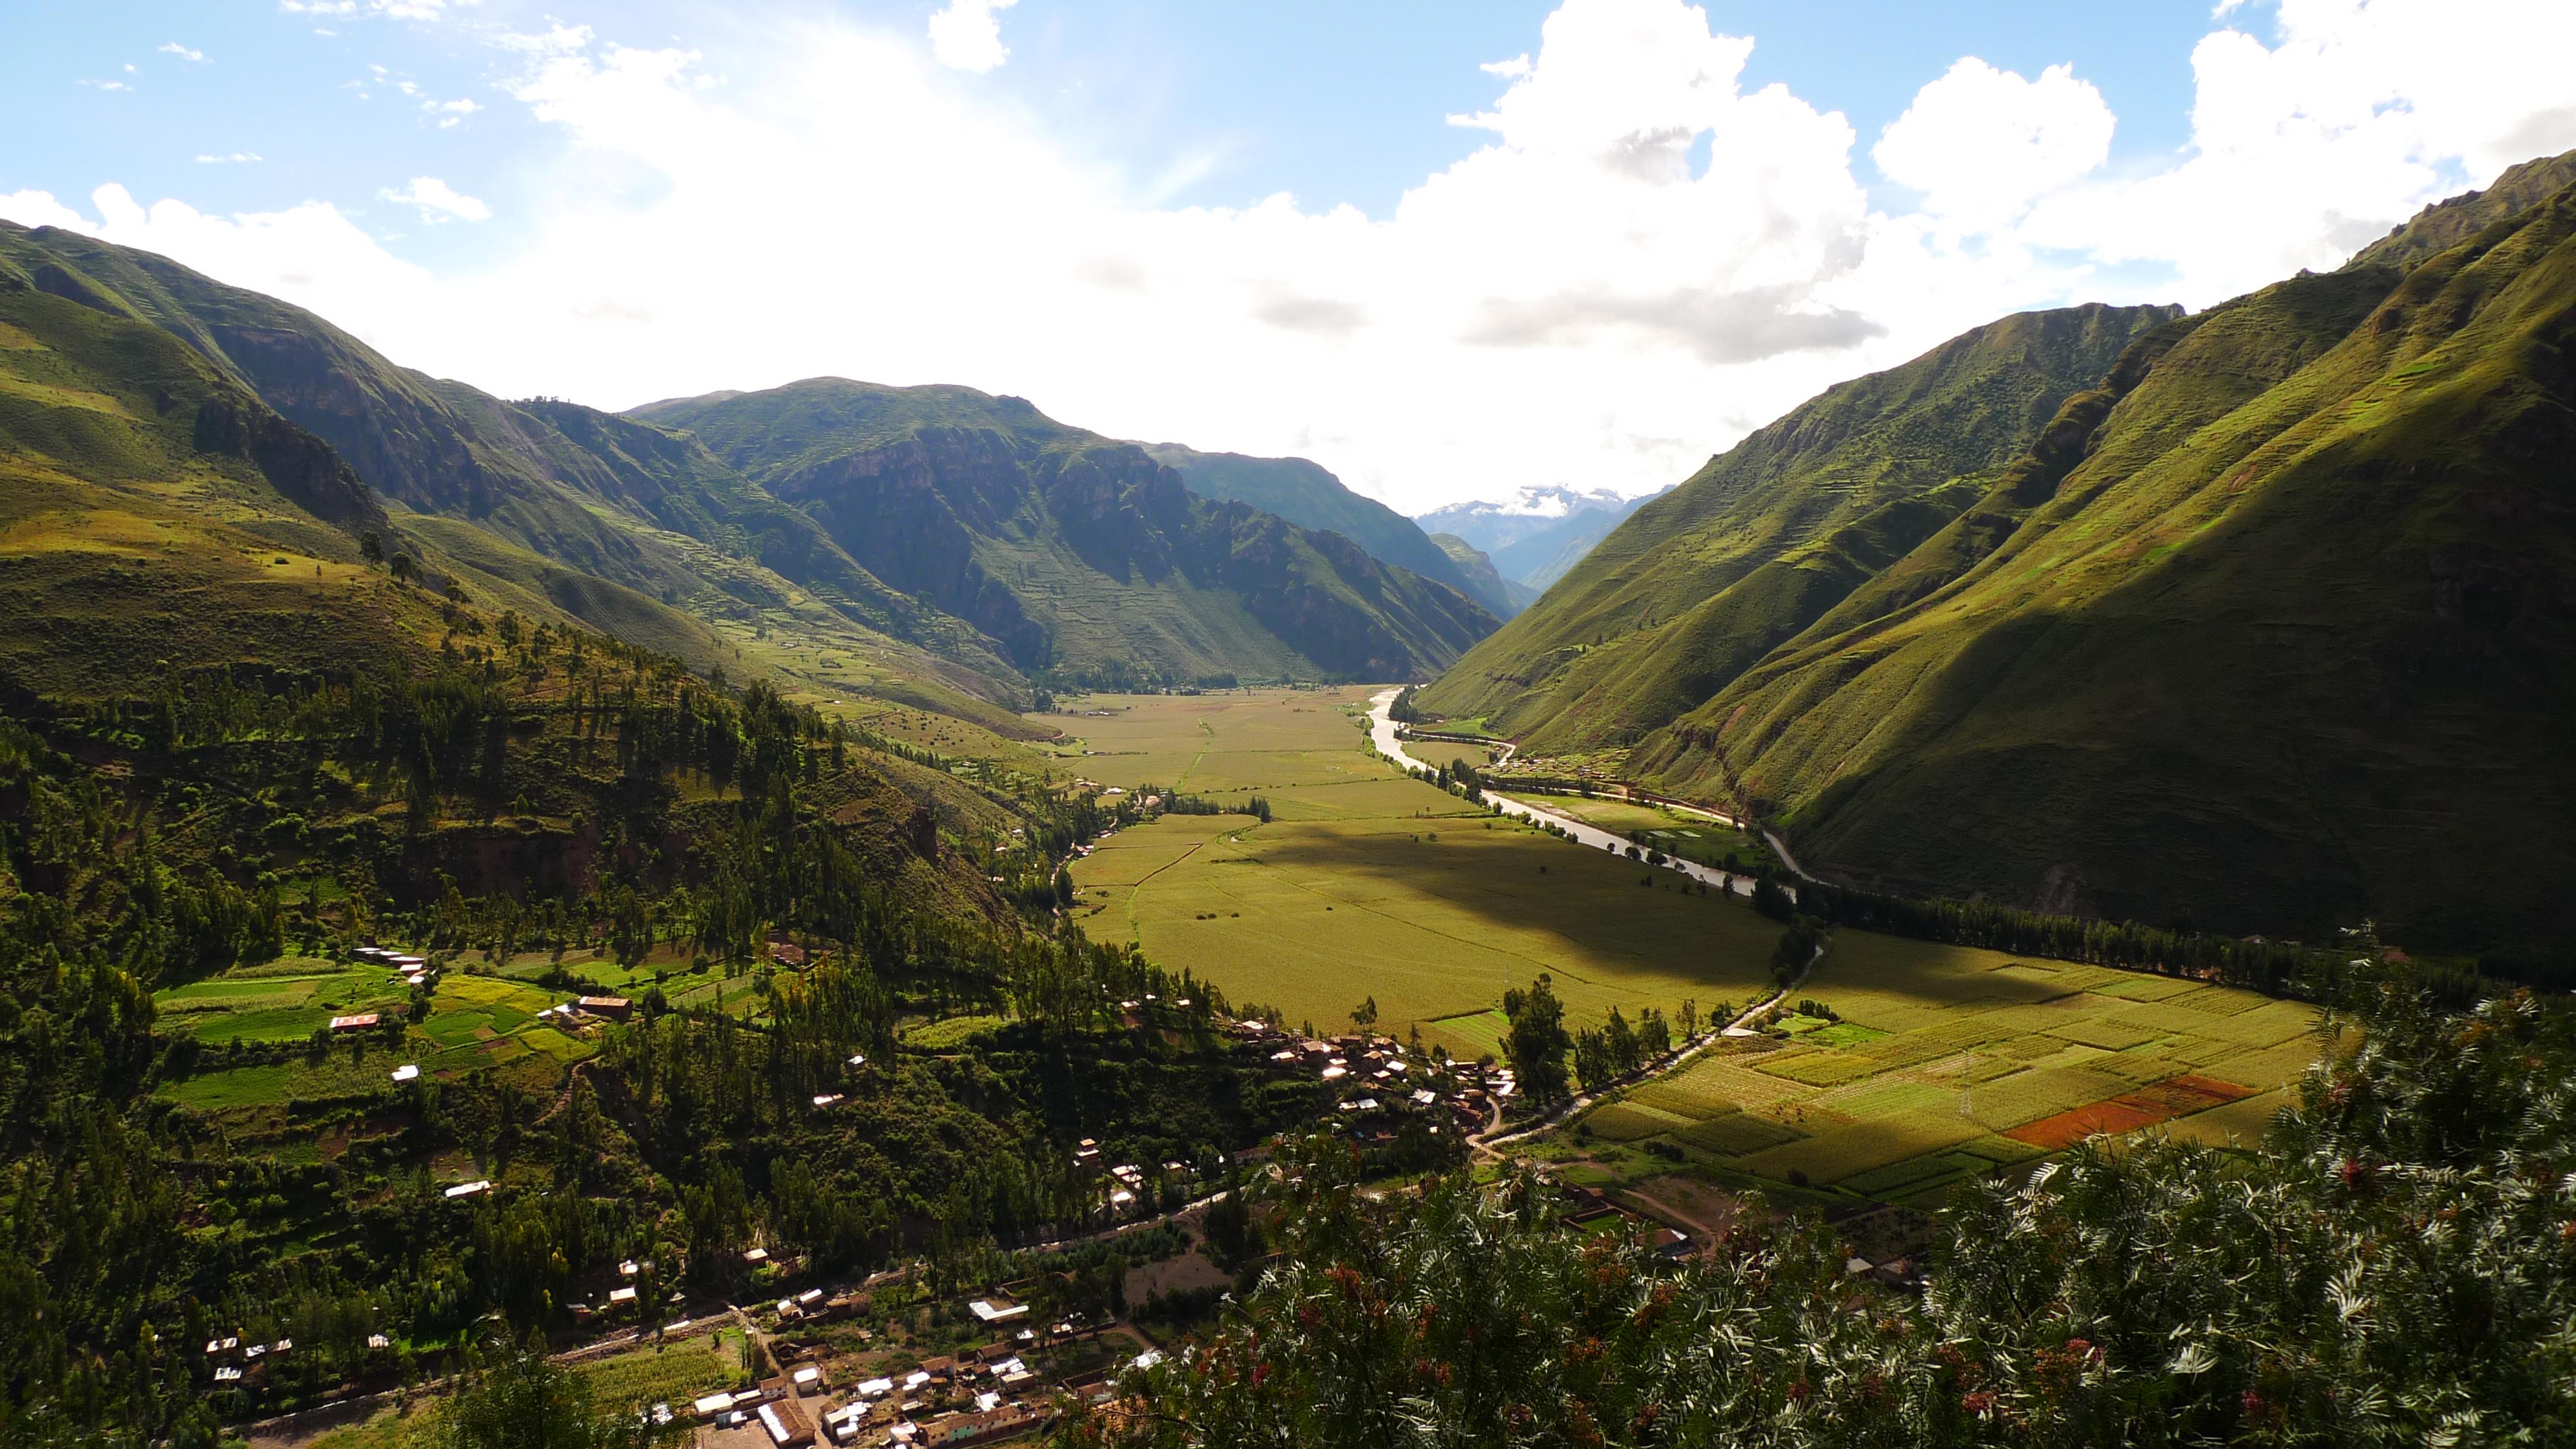 tours machu picchu valle sagrado - tours peru - viajes machupicchu